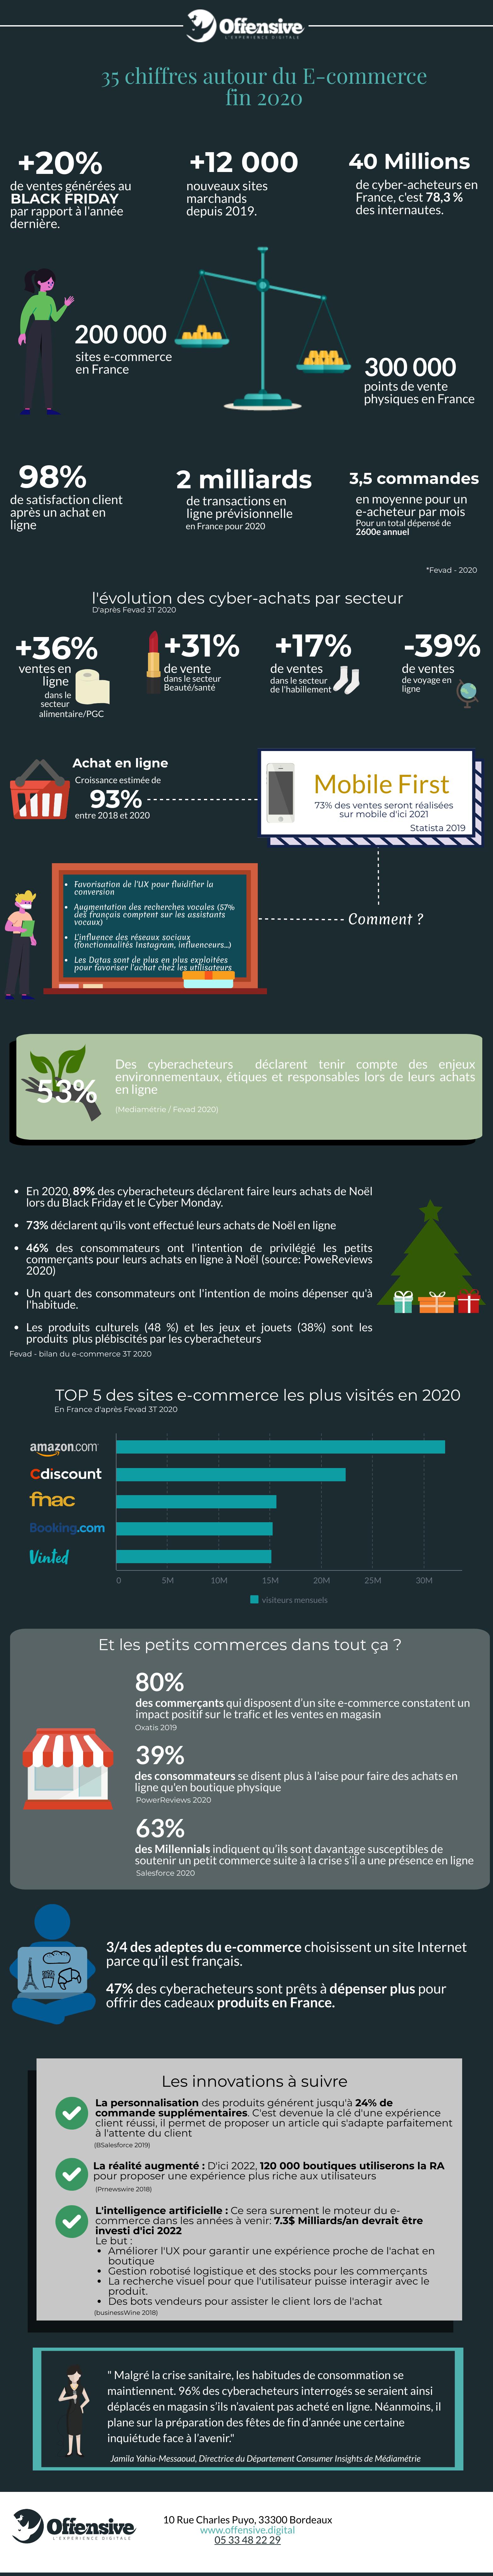 infographie tendance e-commerce 2021